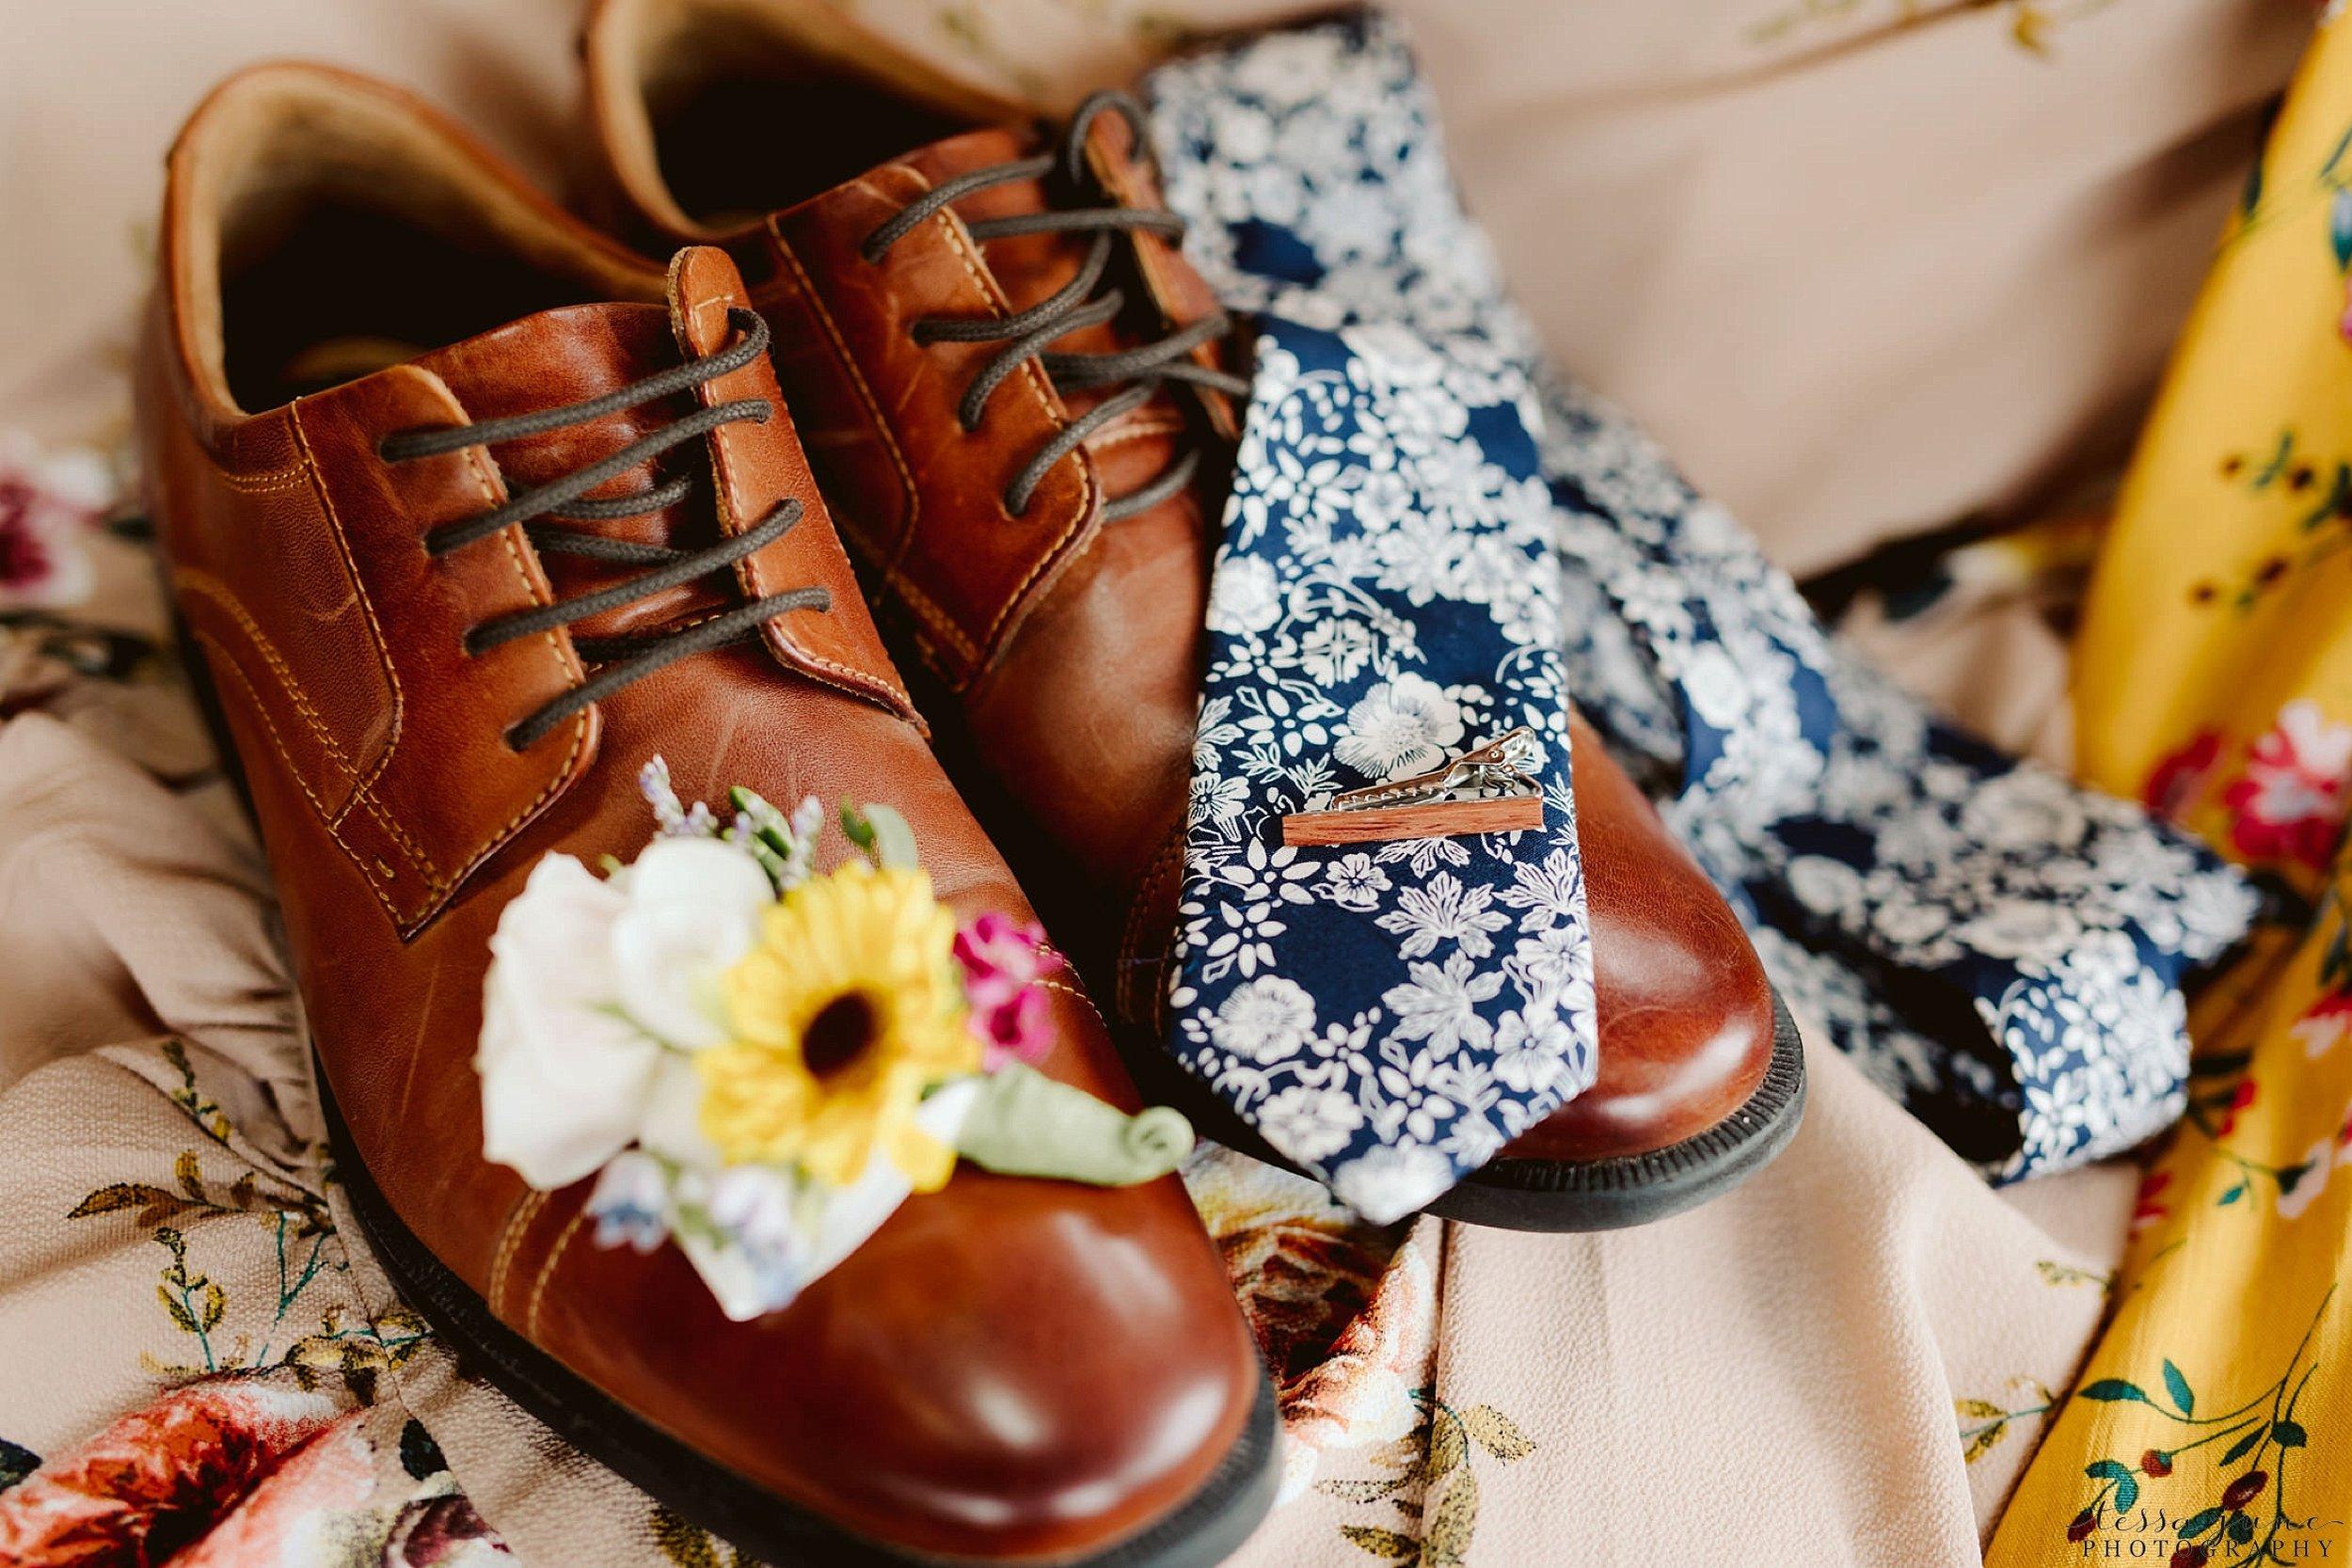 The-grands-at-mulligans-wedding-sartell-minnesota-spring-floral-spring-garden-wedding-21.jpg